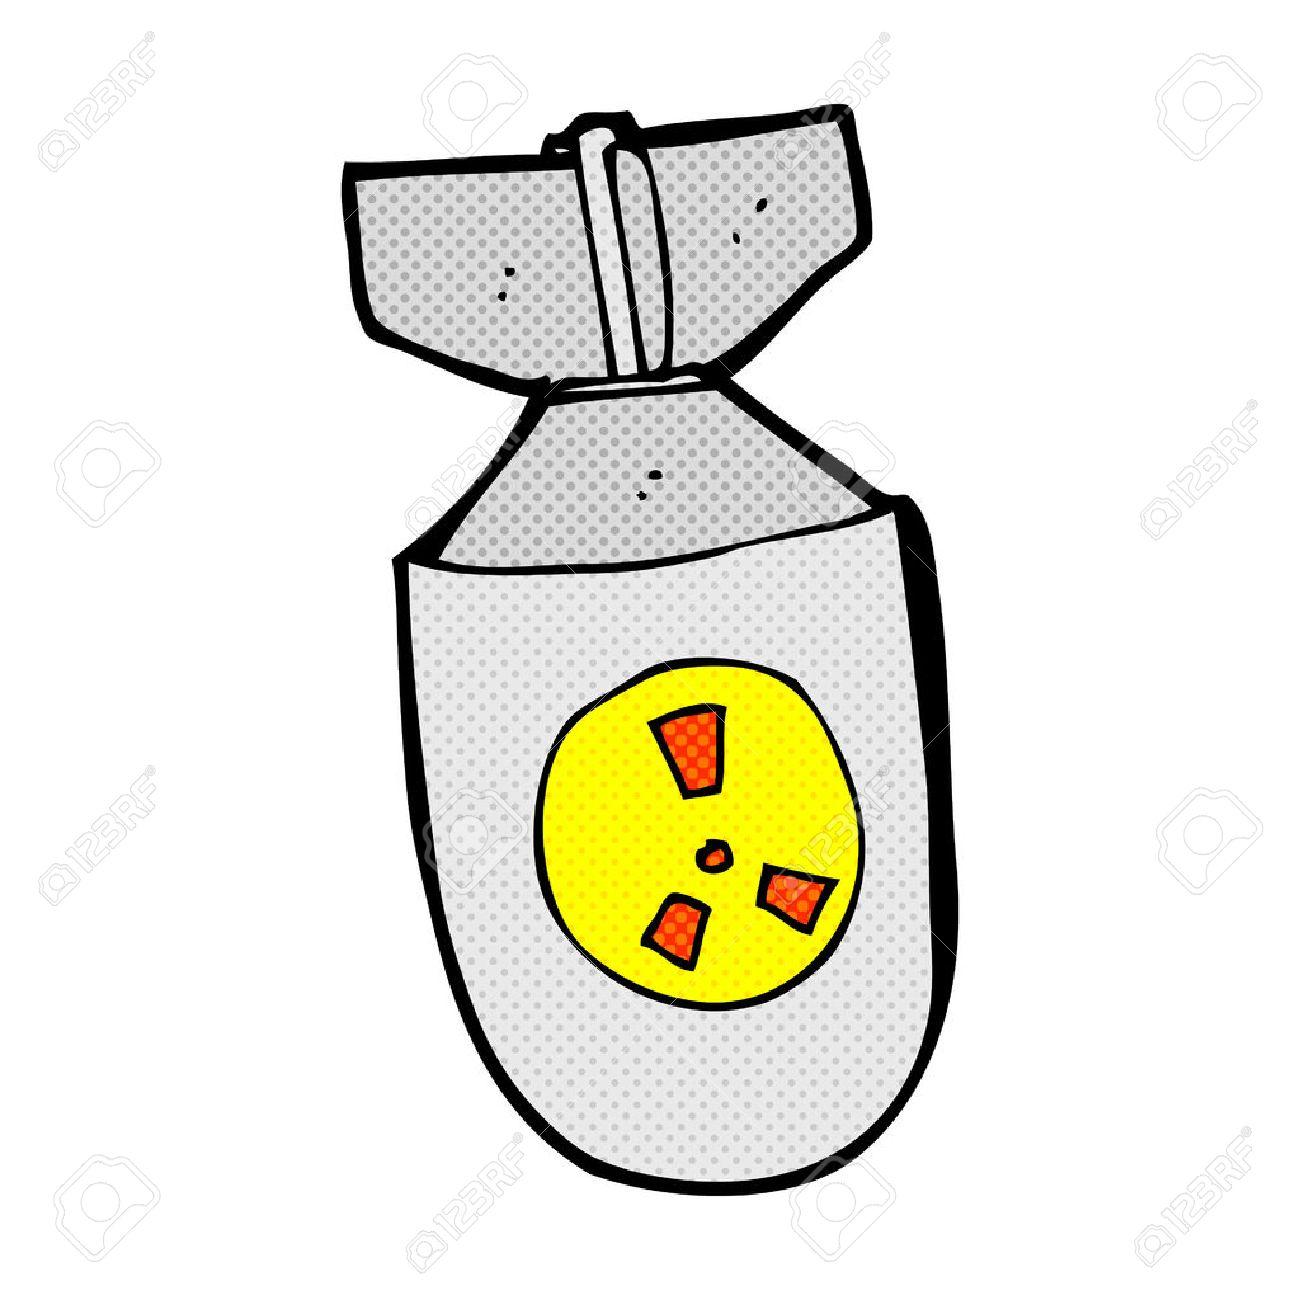 retro comic book style cartoon atom bomb royalty free cliparts rh 123rf com Atomic Bomb Cartoon Manhattan Project Atomic Bomb